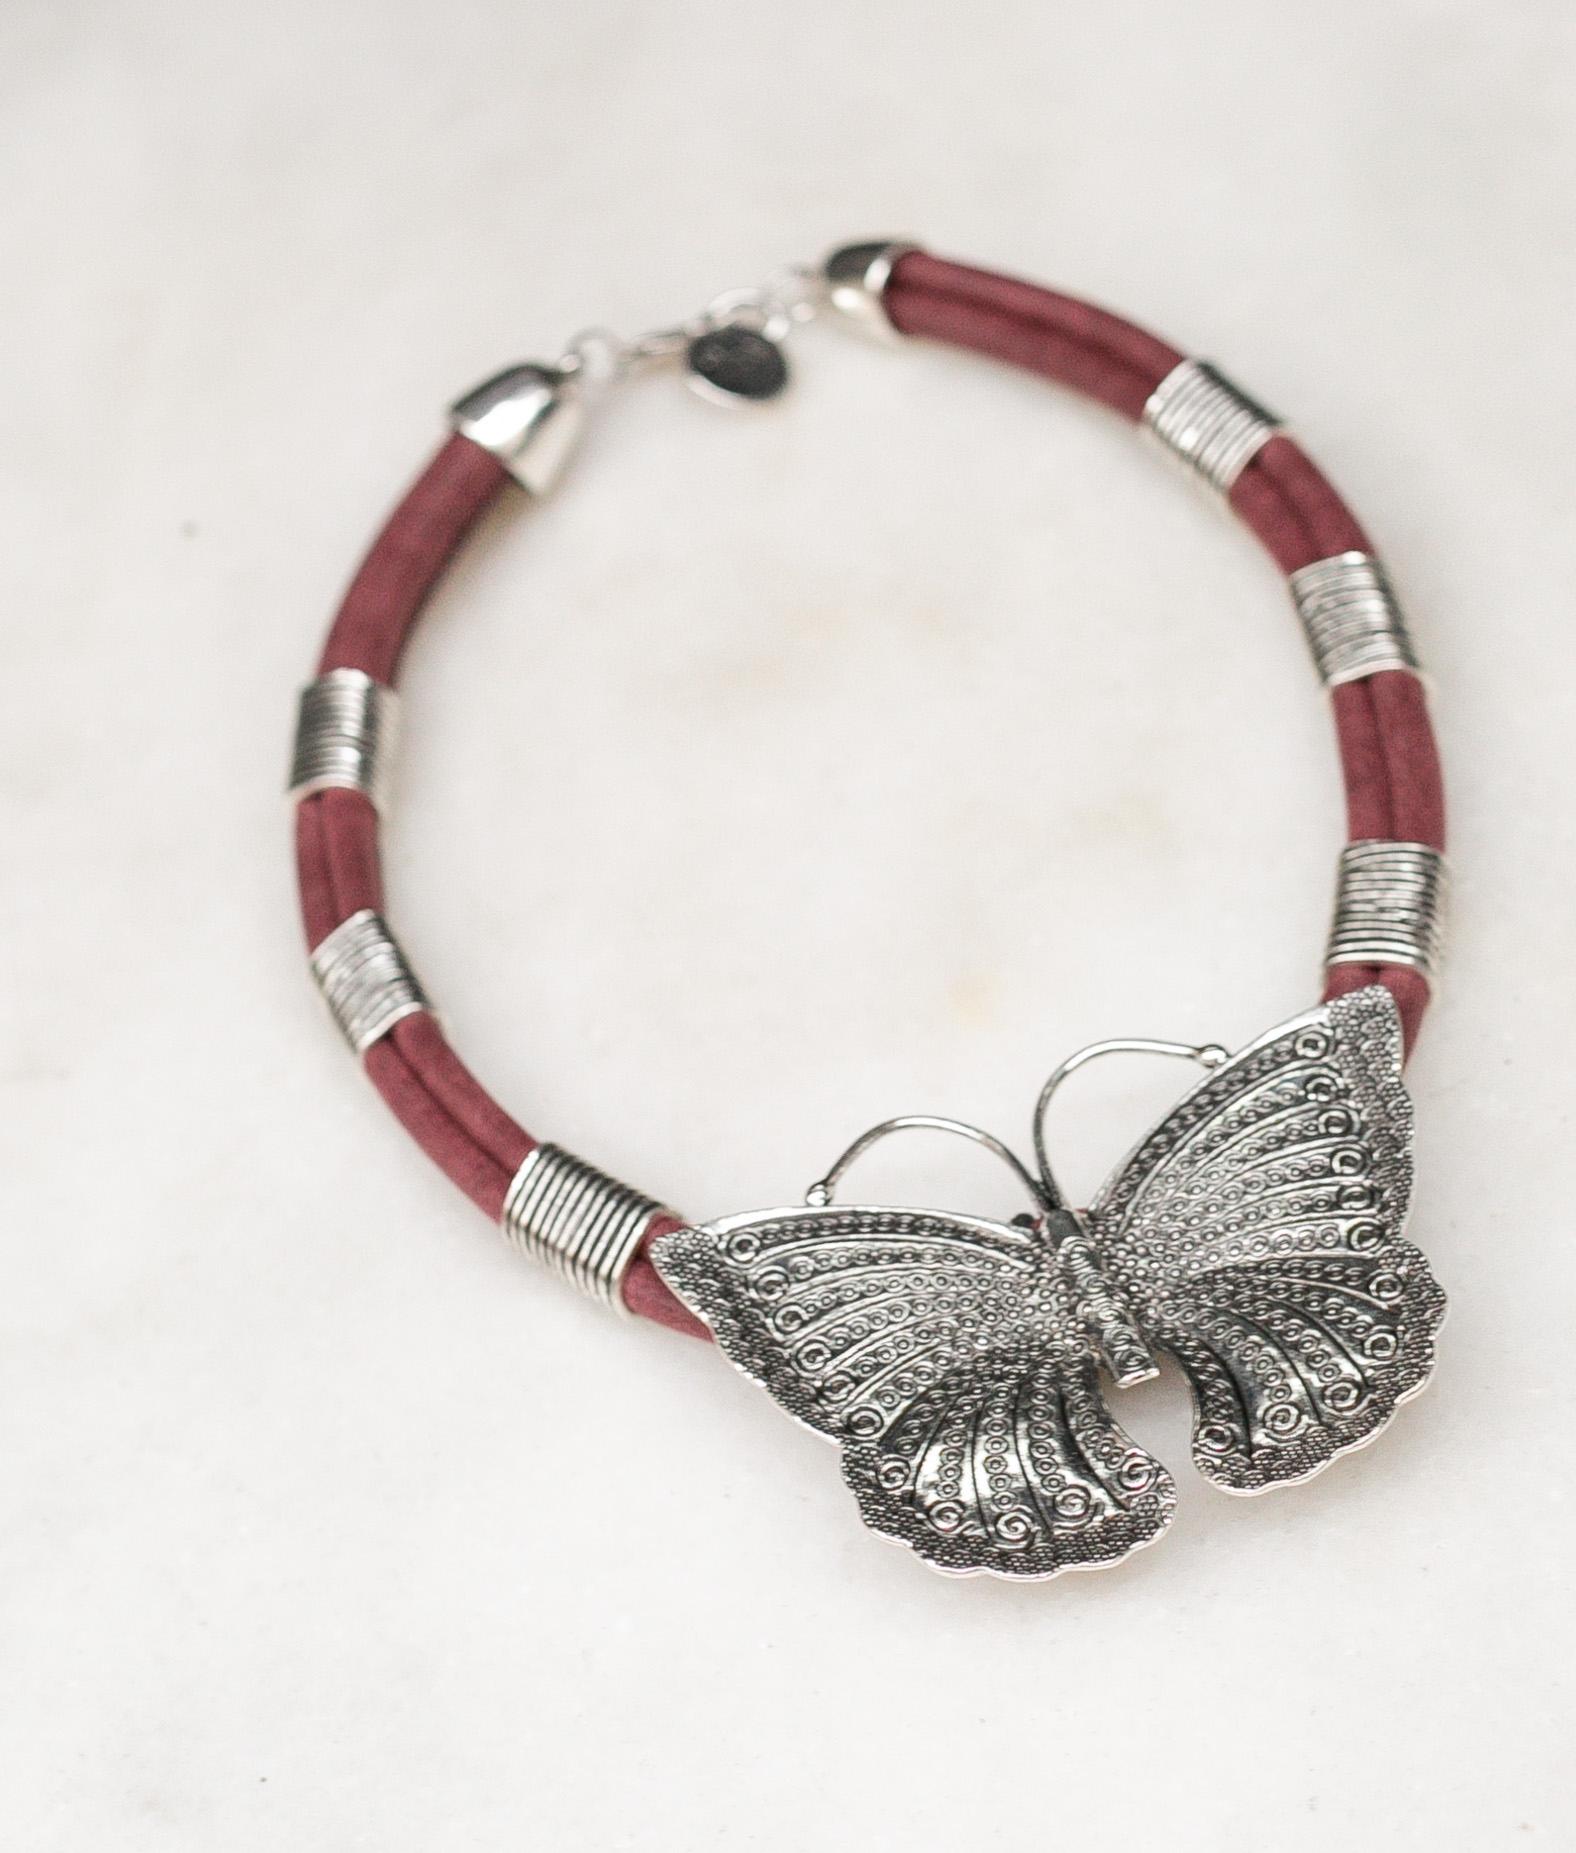 Necklace Tarwy - Maroon